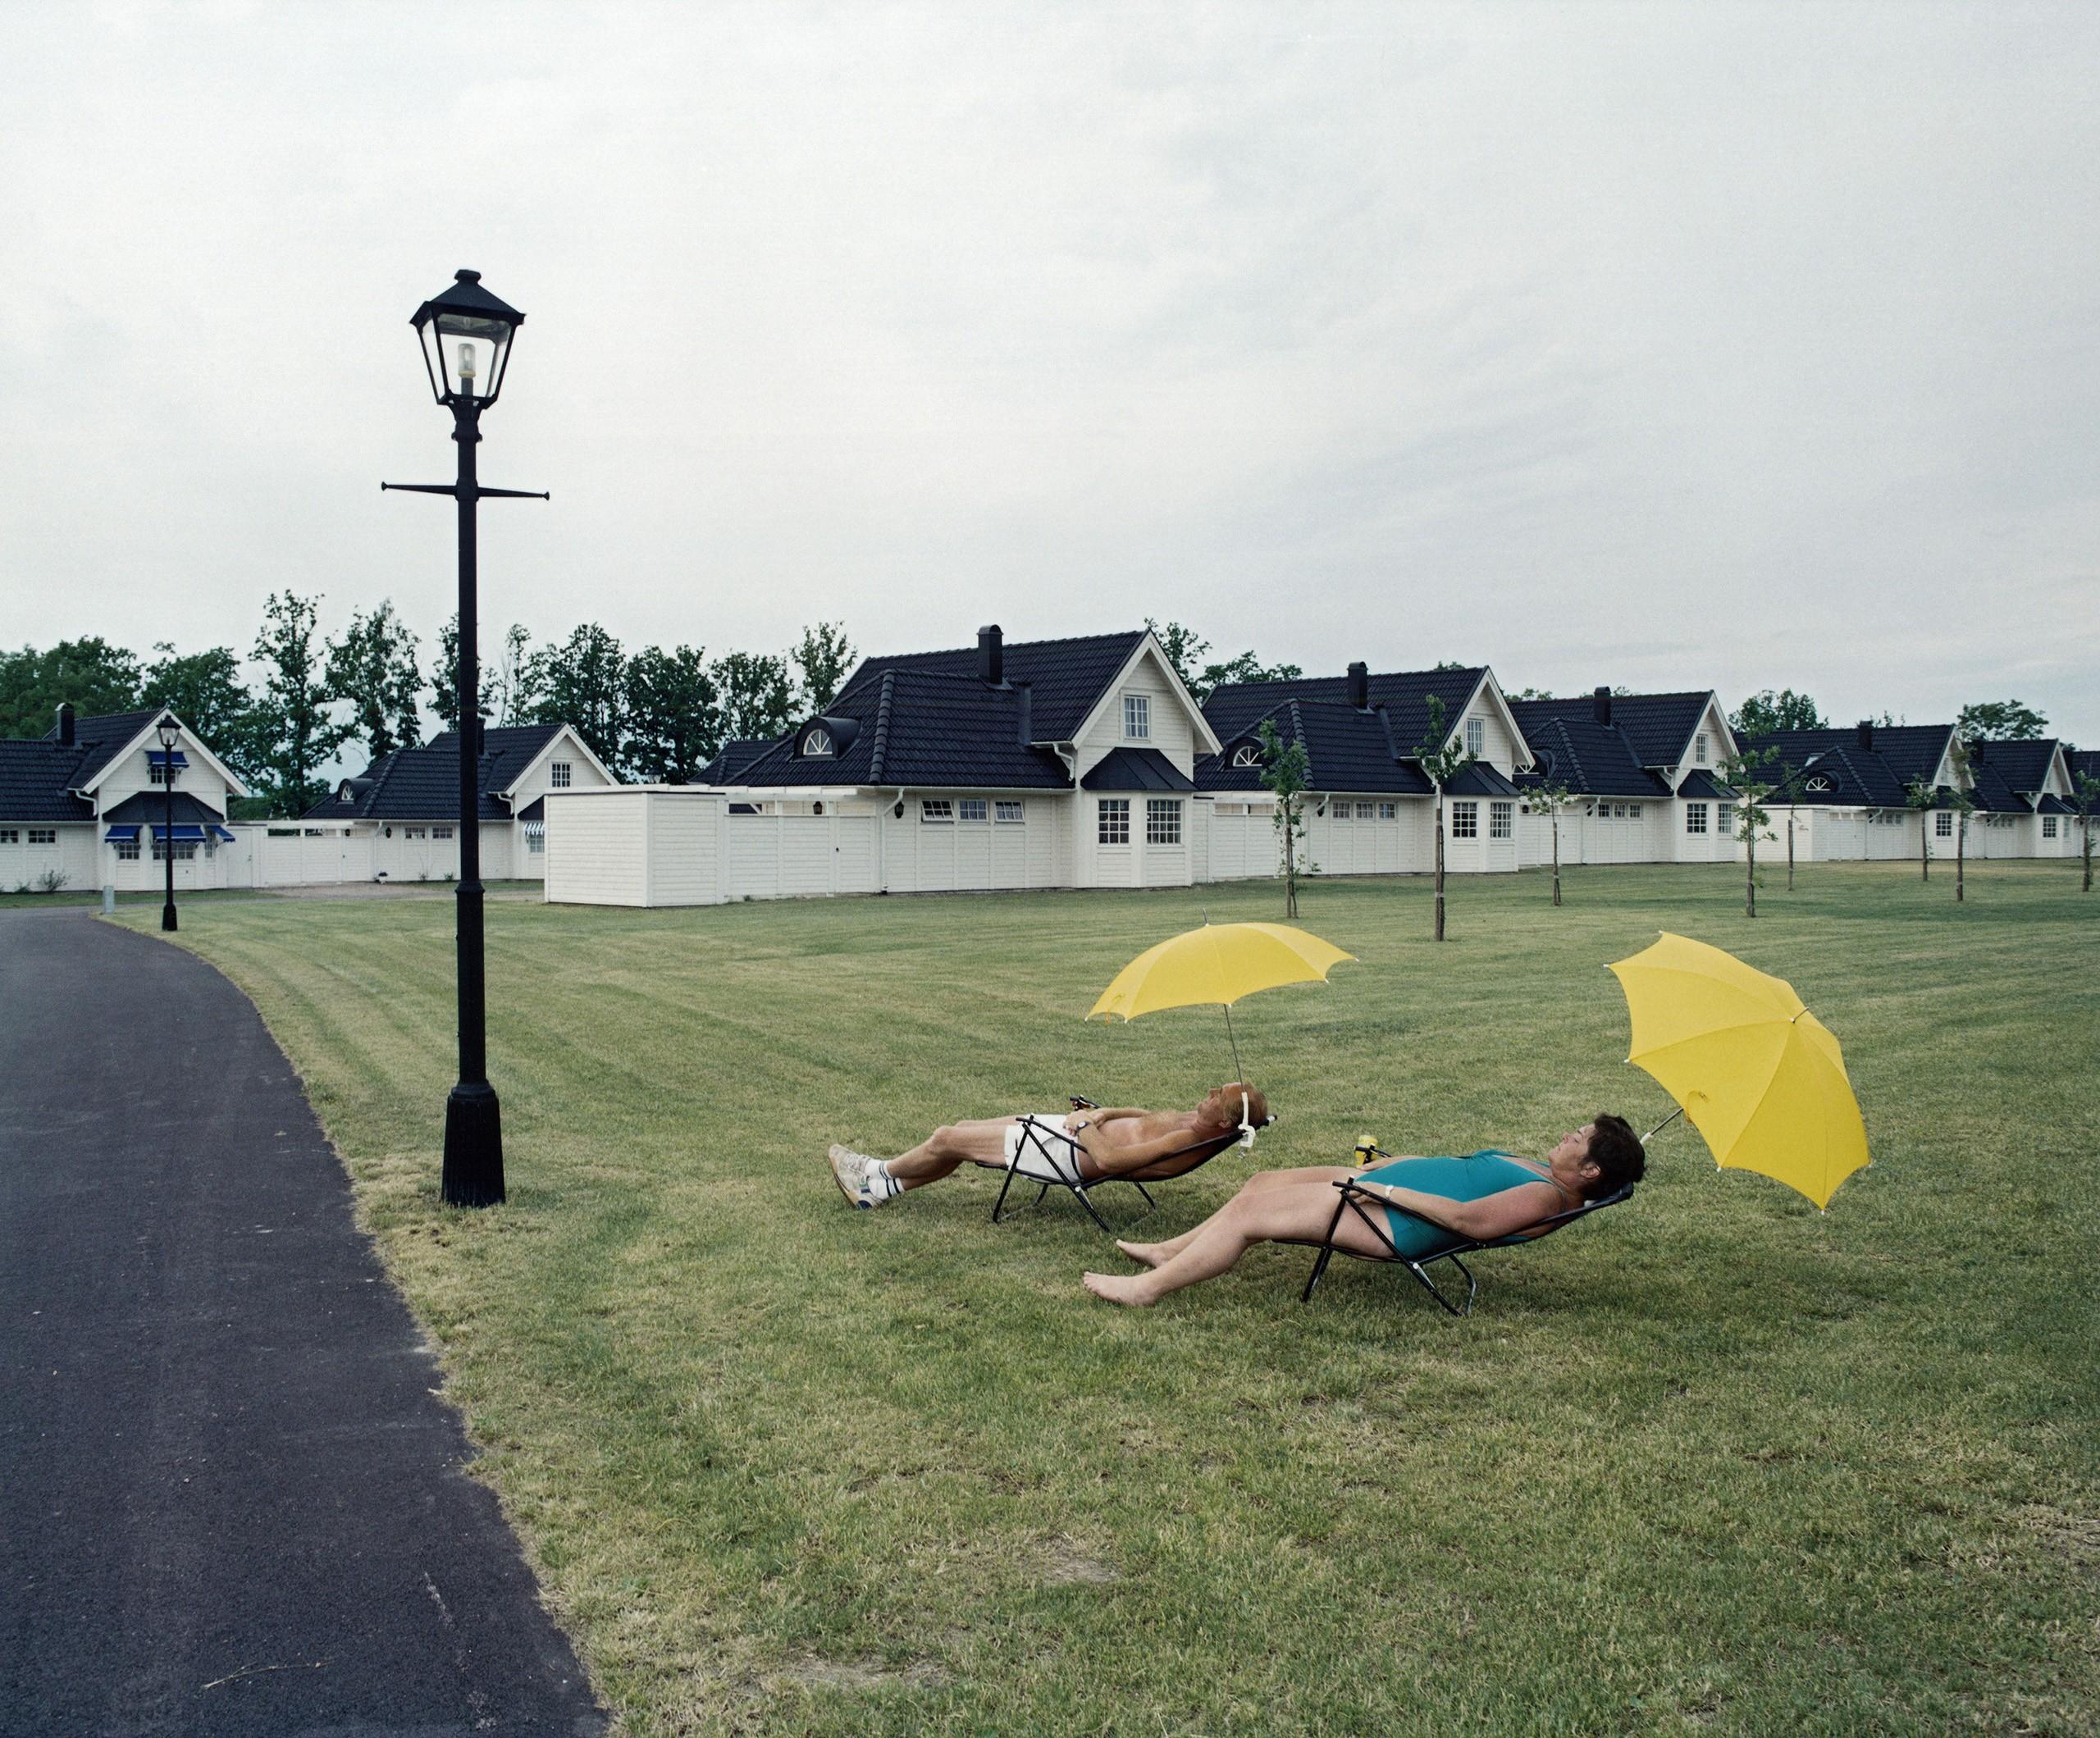 Эланд, Швеция, 1991. Фотограф Ларс Тунбьёрк